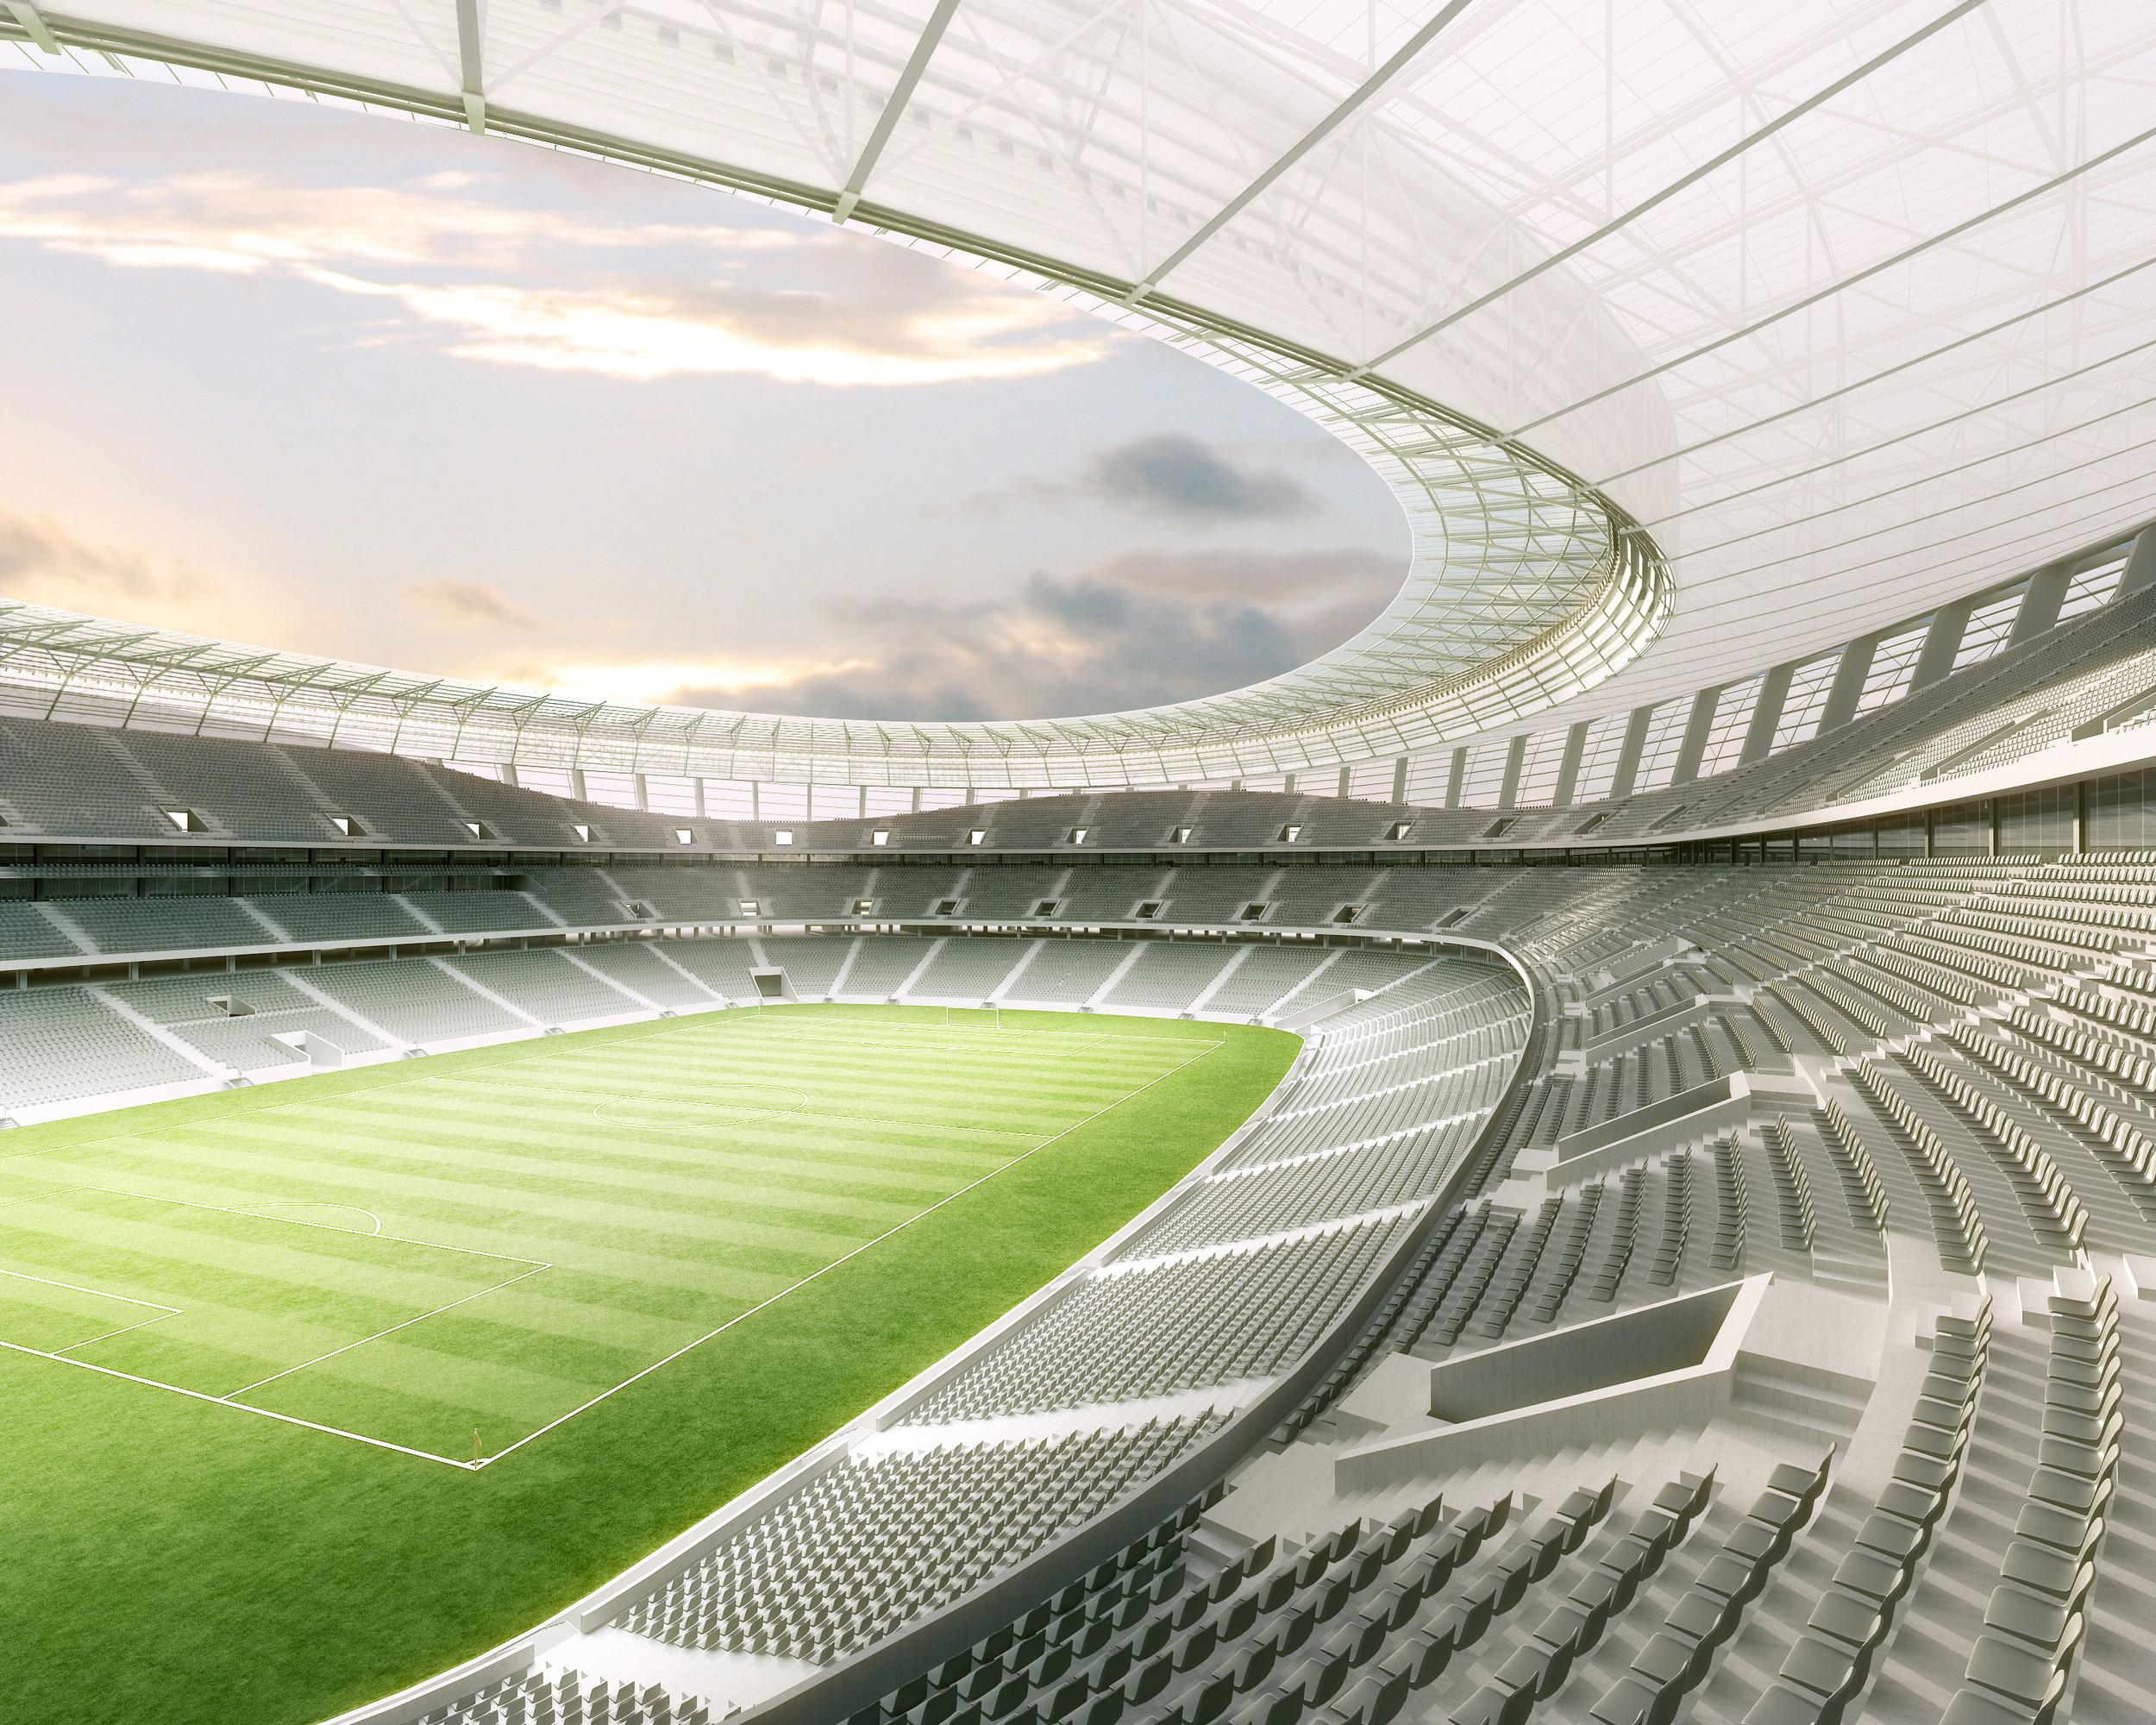 gmp_stadion capetown_4.jpg